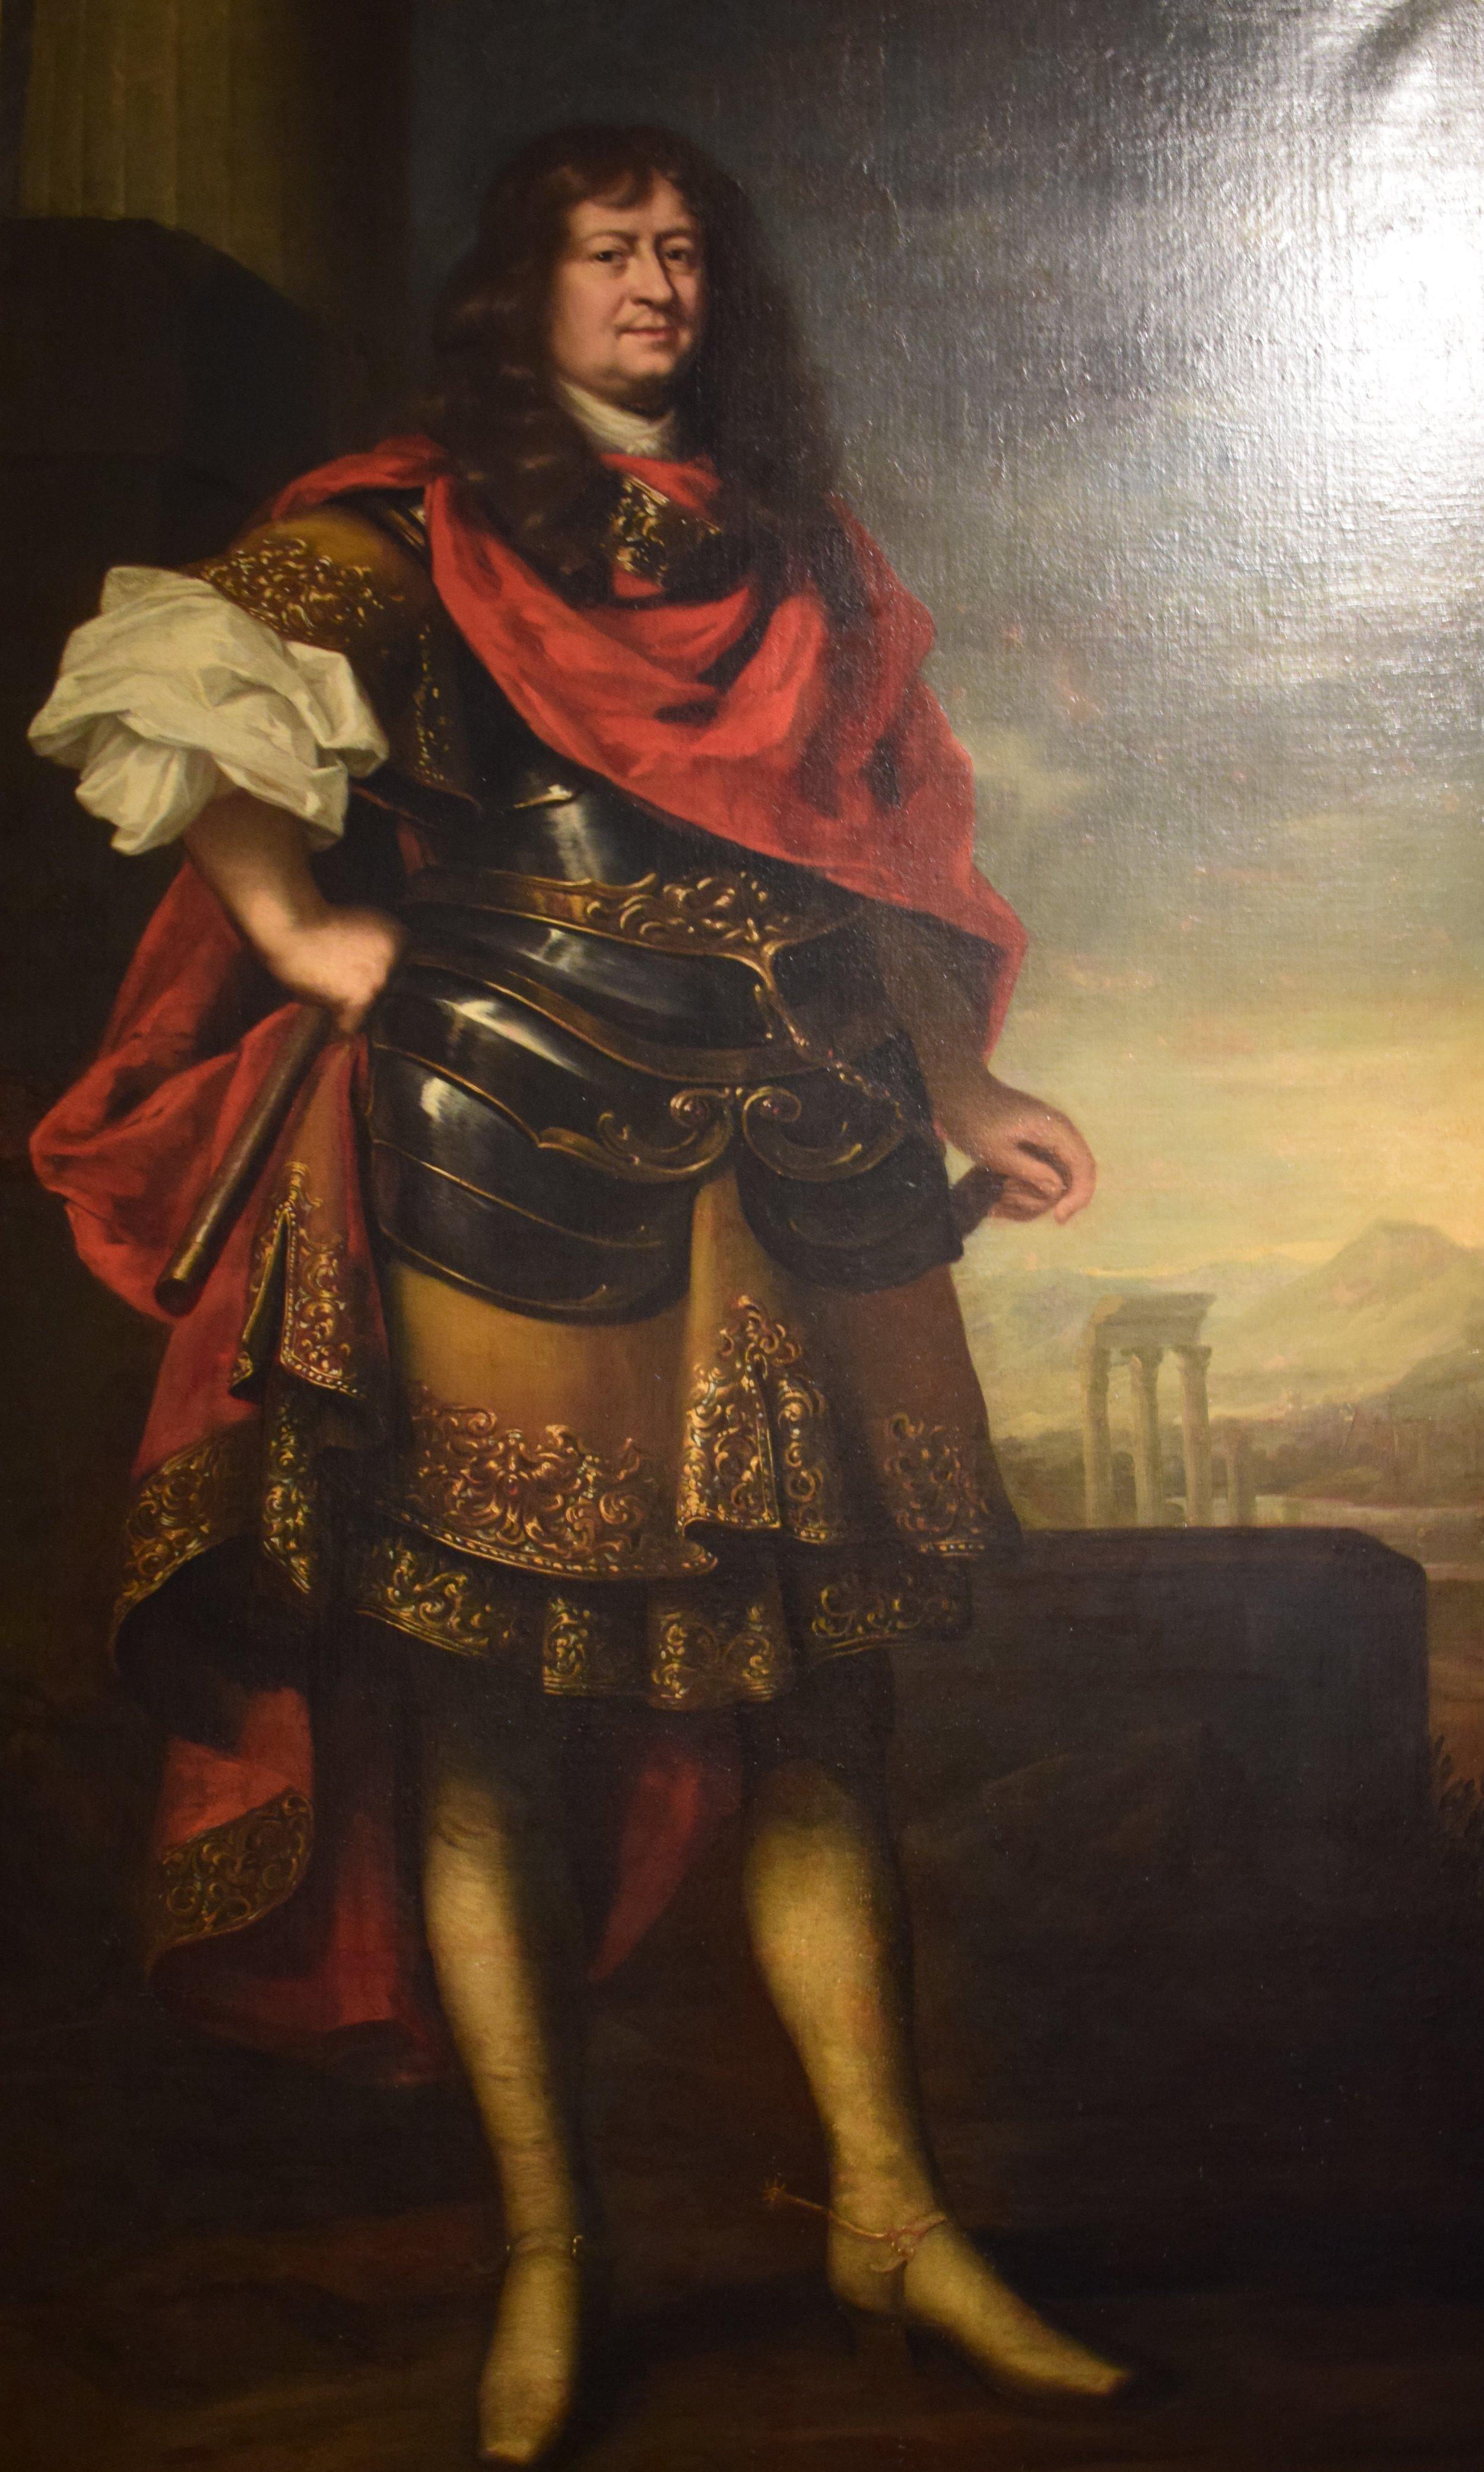 David Klöcker Ehrenstrahl, Friherre Bengt Horn som romerk fältherre (Baron Bengt Horn as Roman General), ok. 1662